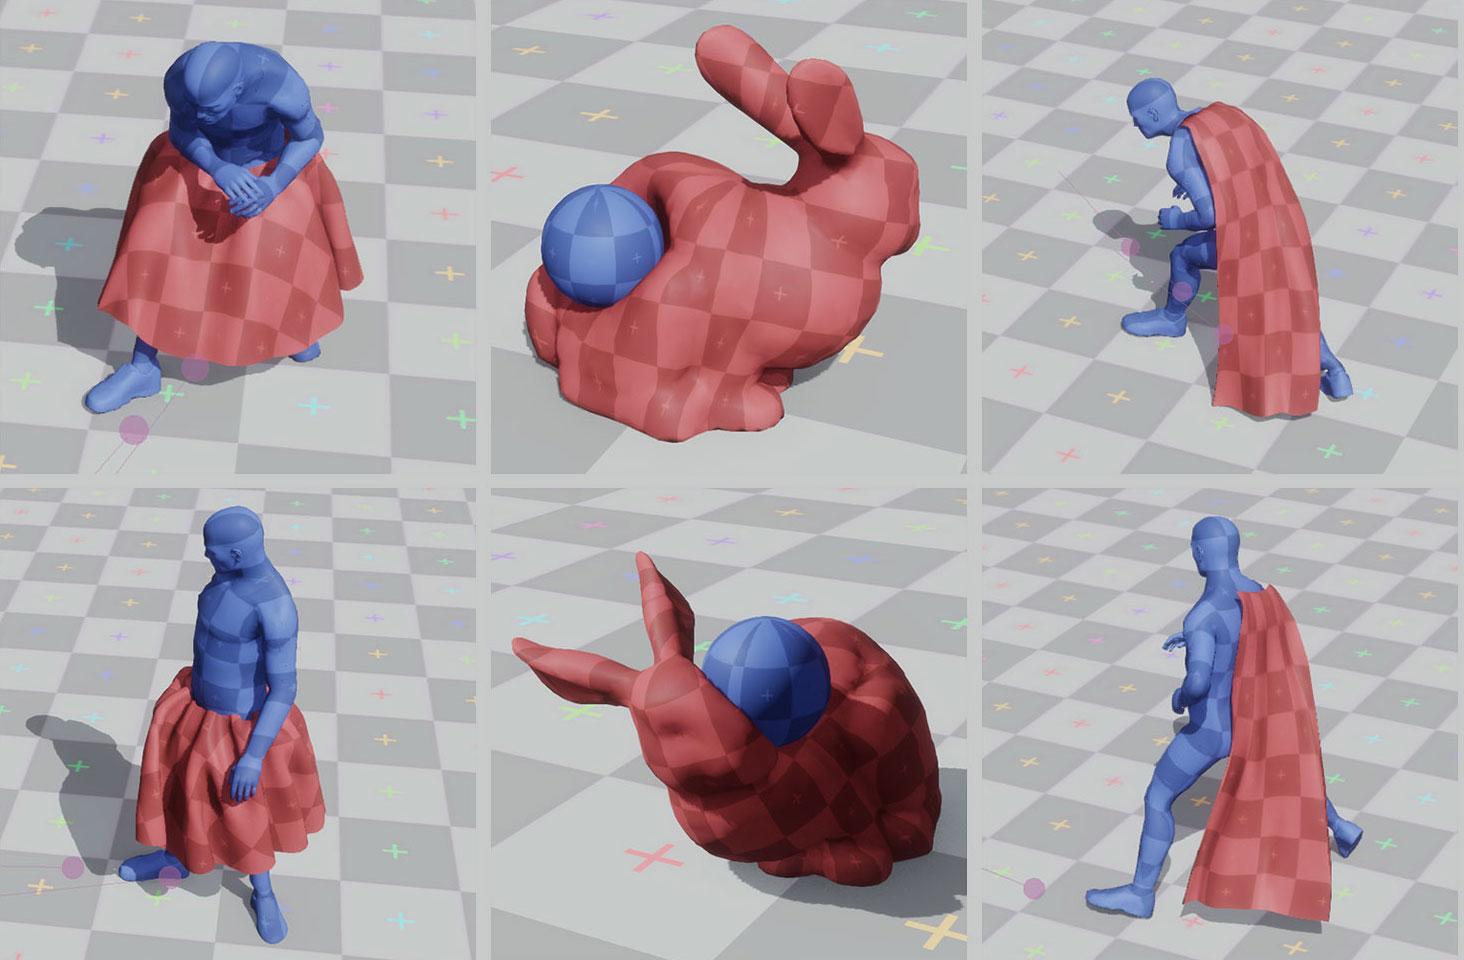 Ubisoft La Forge produces a data-driven physics simulation based on Machine Learning